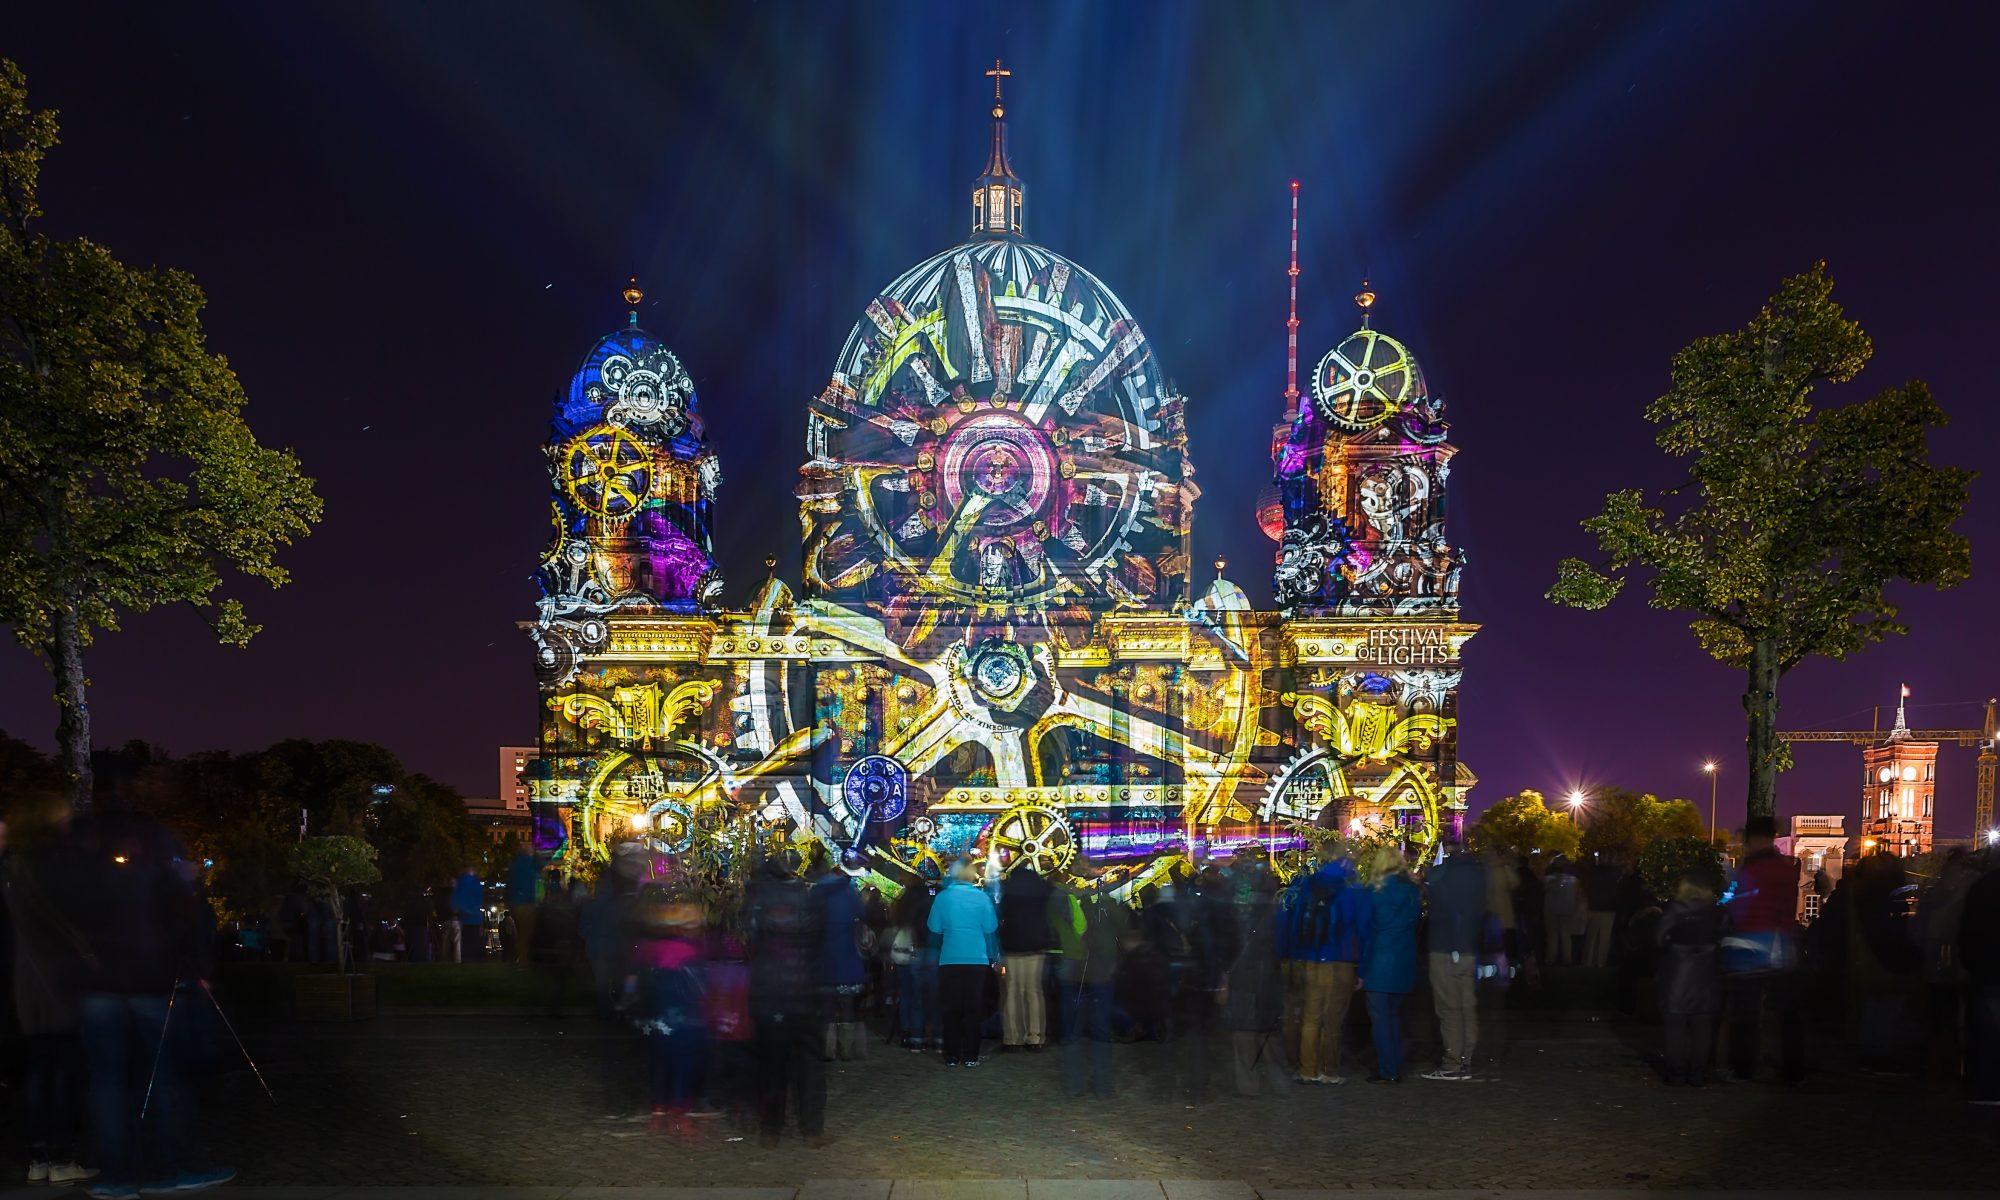 Brandenburger Tor ◆ With love to Berlin ◆ powered by Zander & Parnter